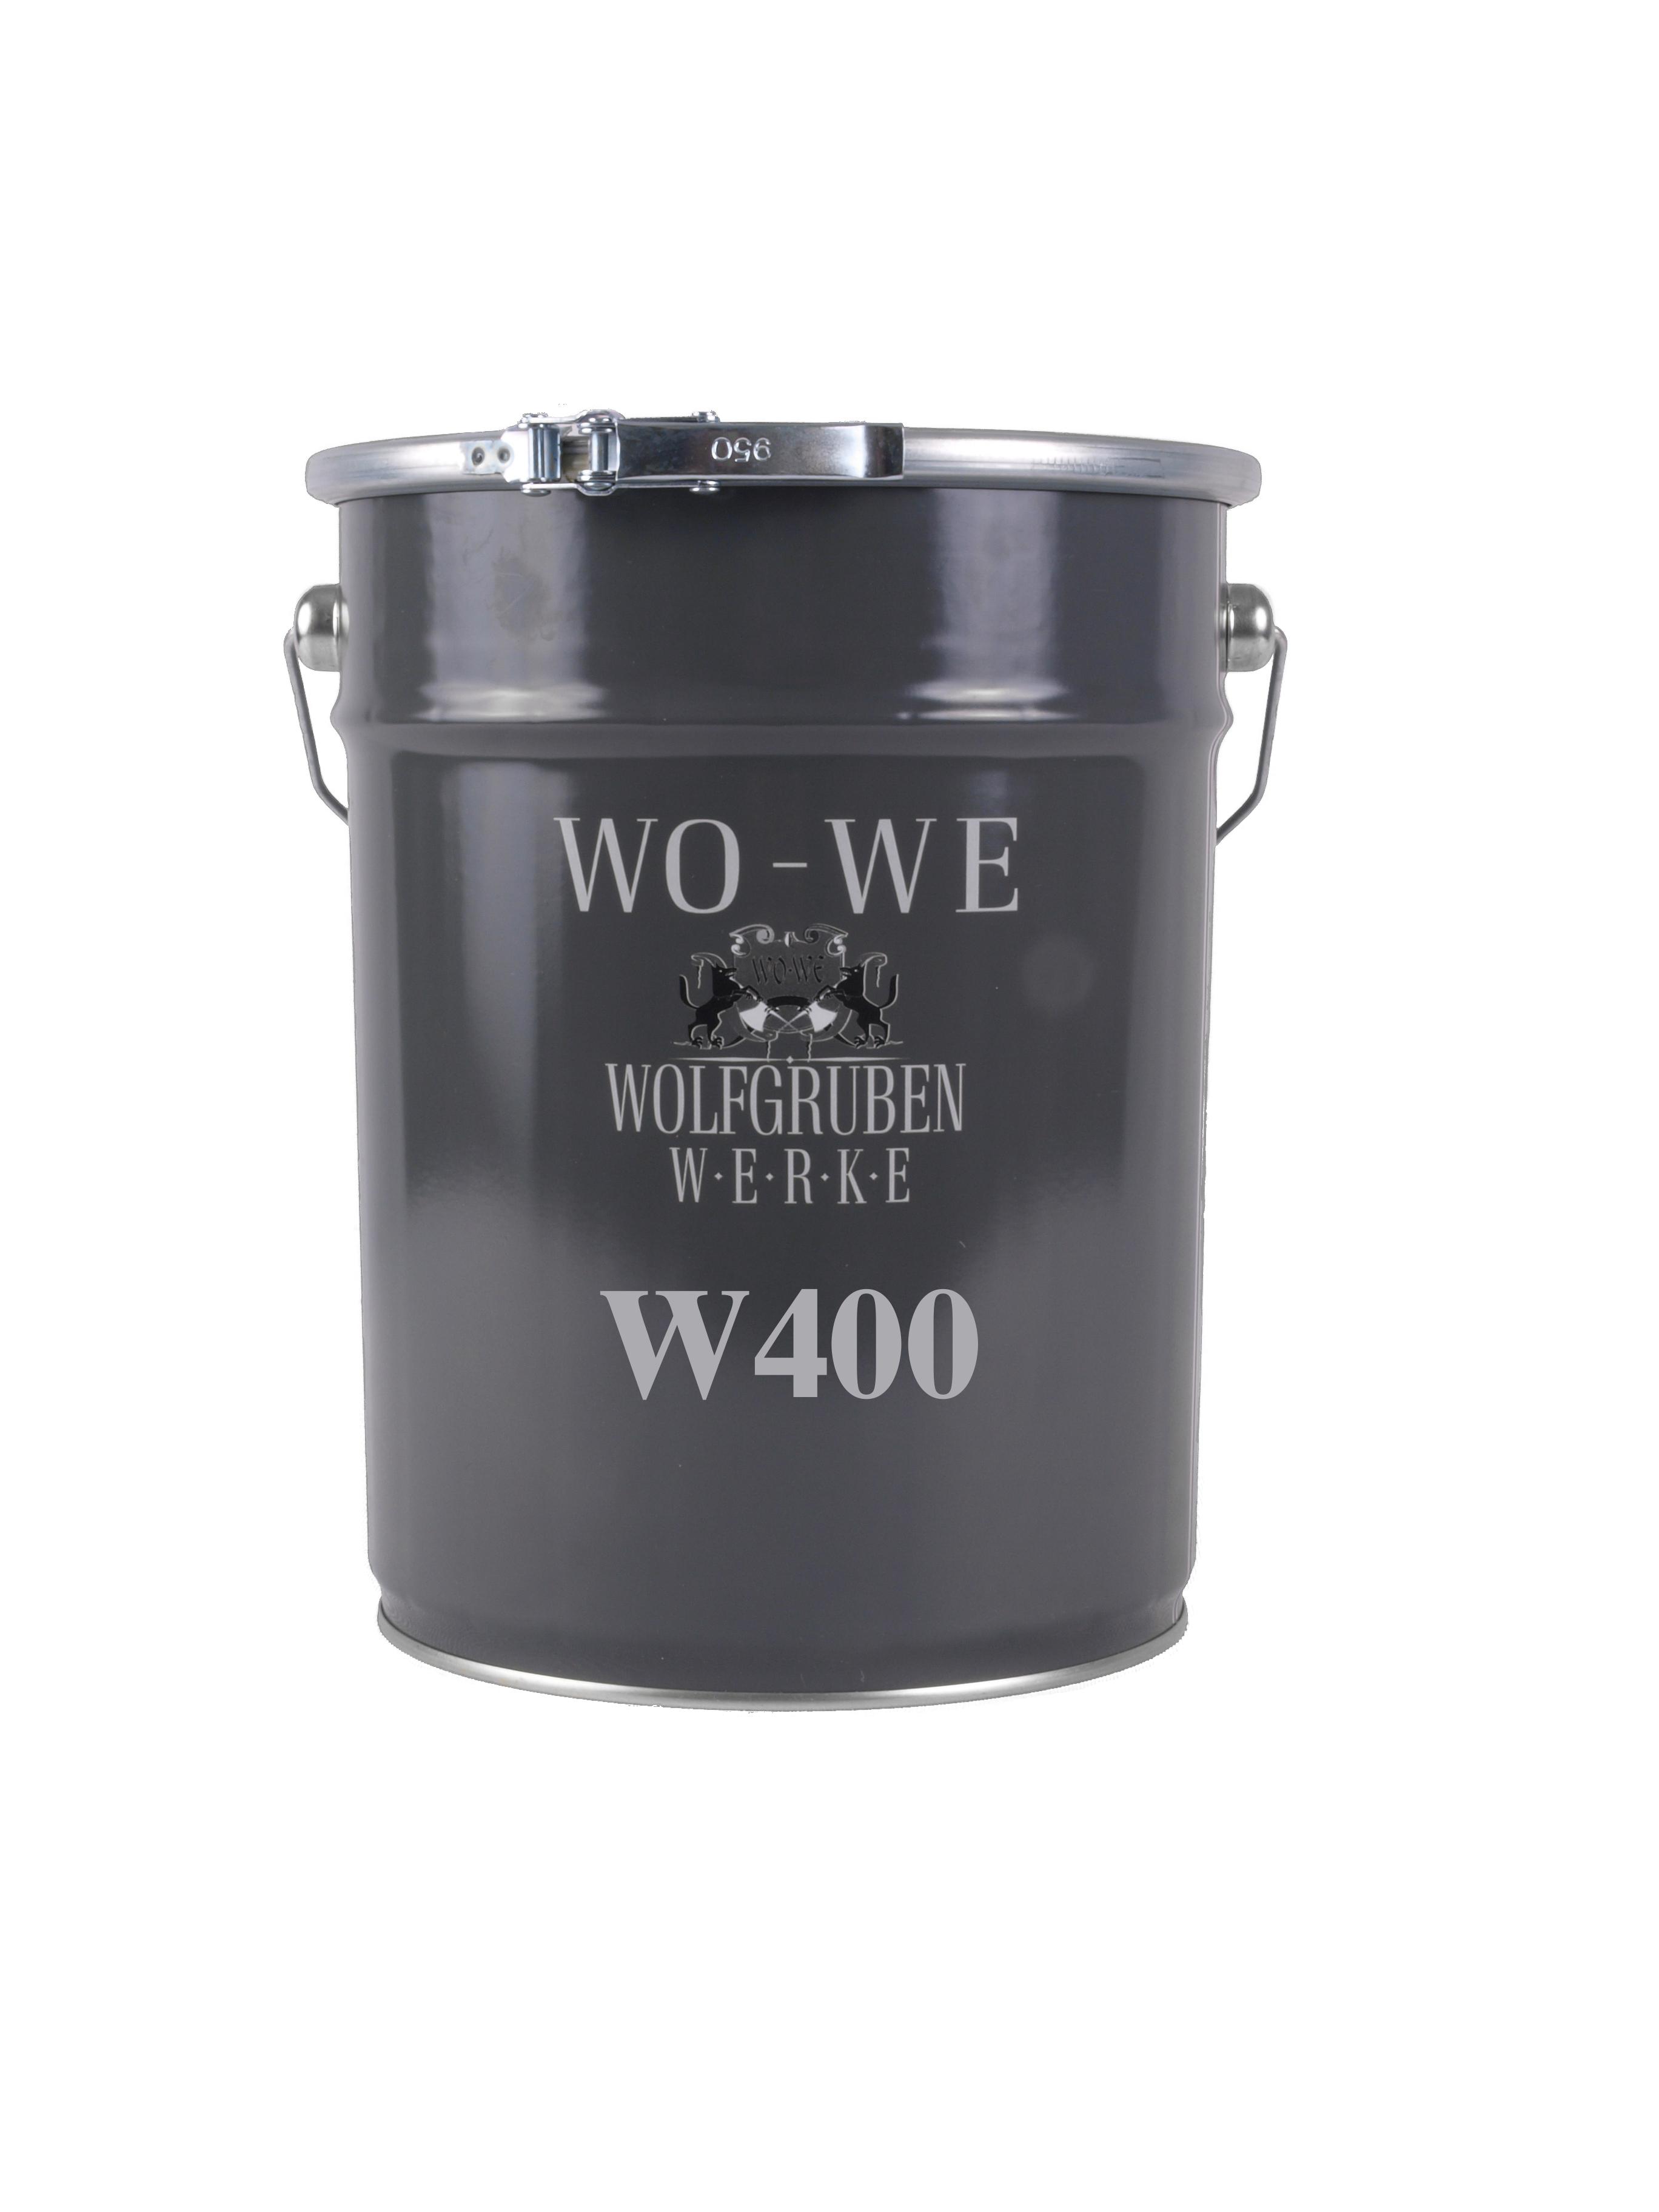 Eimer_W400.jpg?dl=0